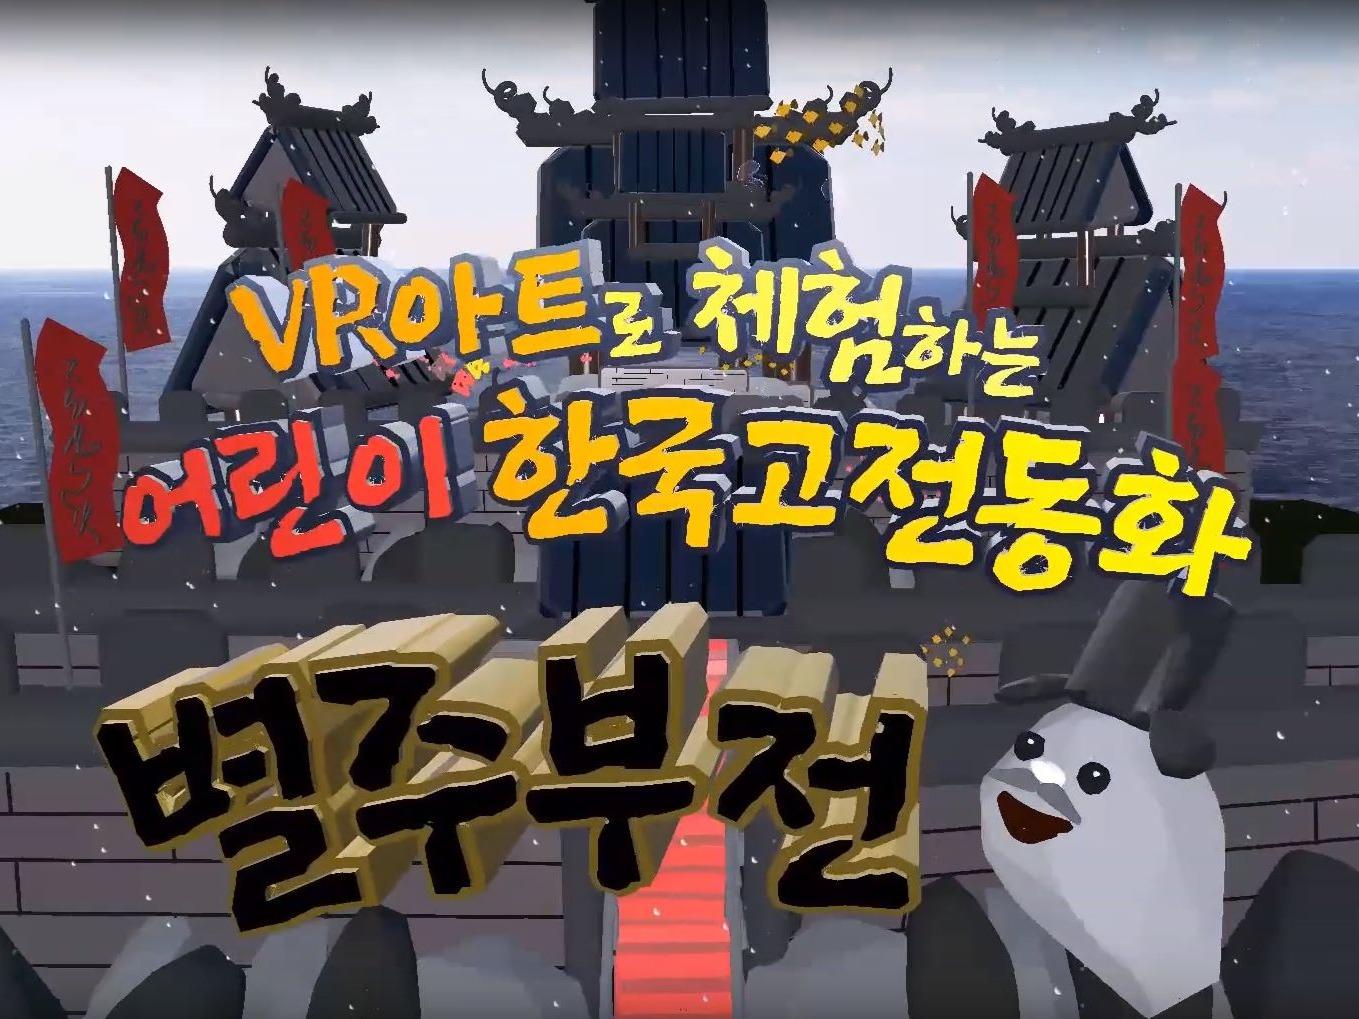 VR-별주부전_edited